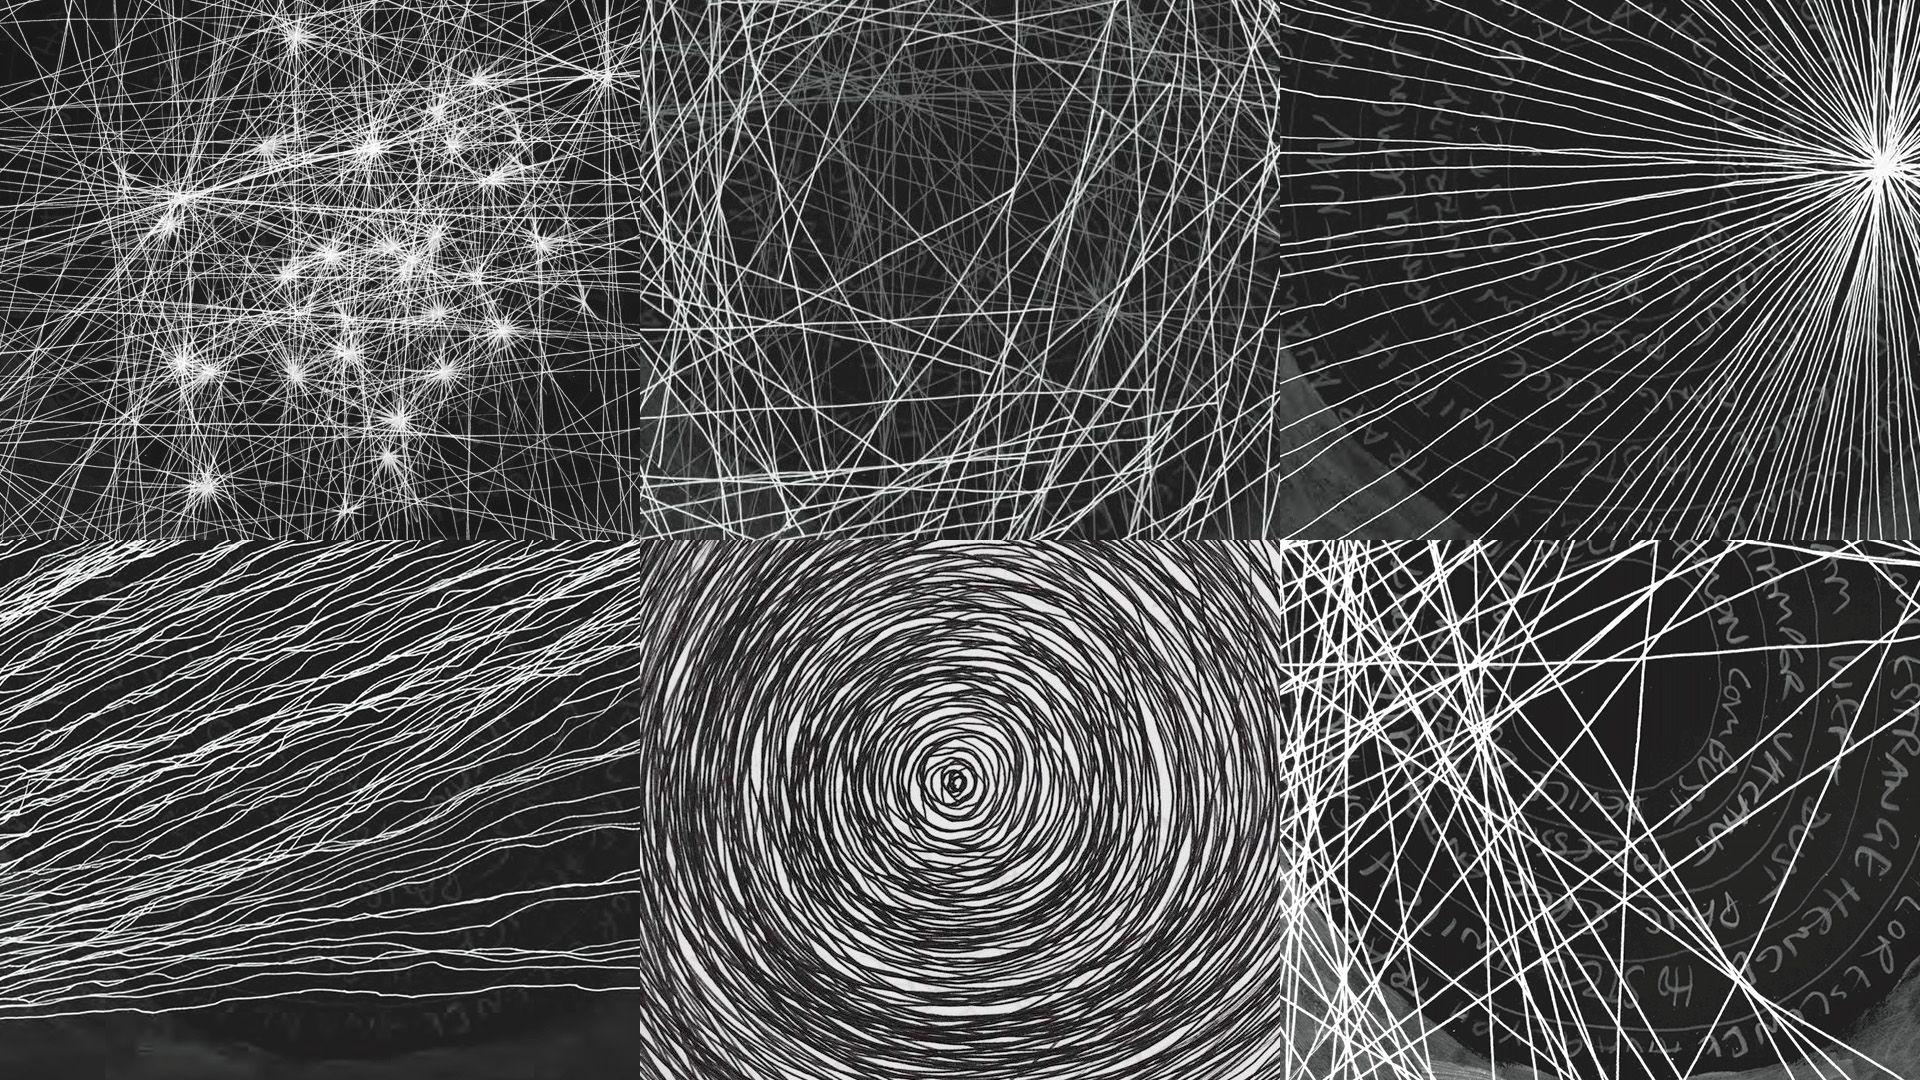 TKOL singles cover art [1920x1080][x-post /r/radiohead] | Reddit HD Wallpapers | Radiohead ...